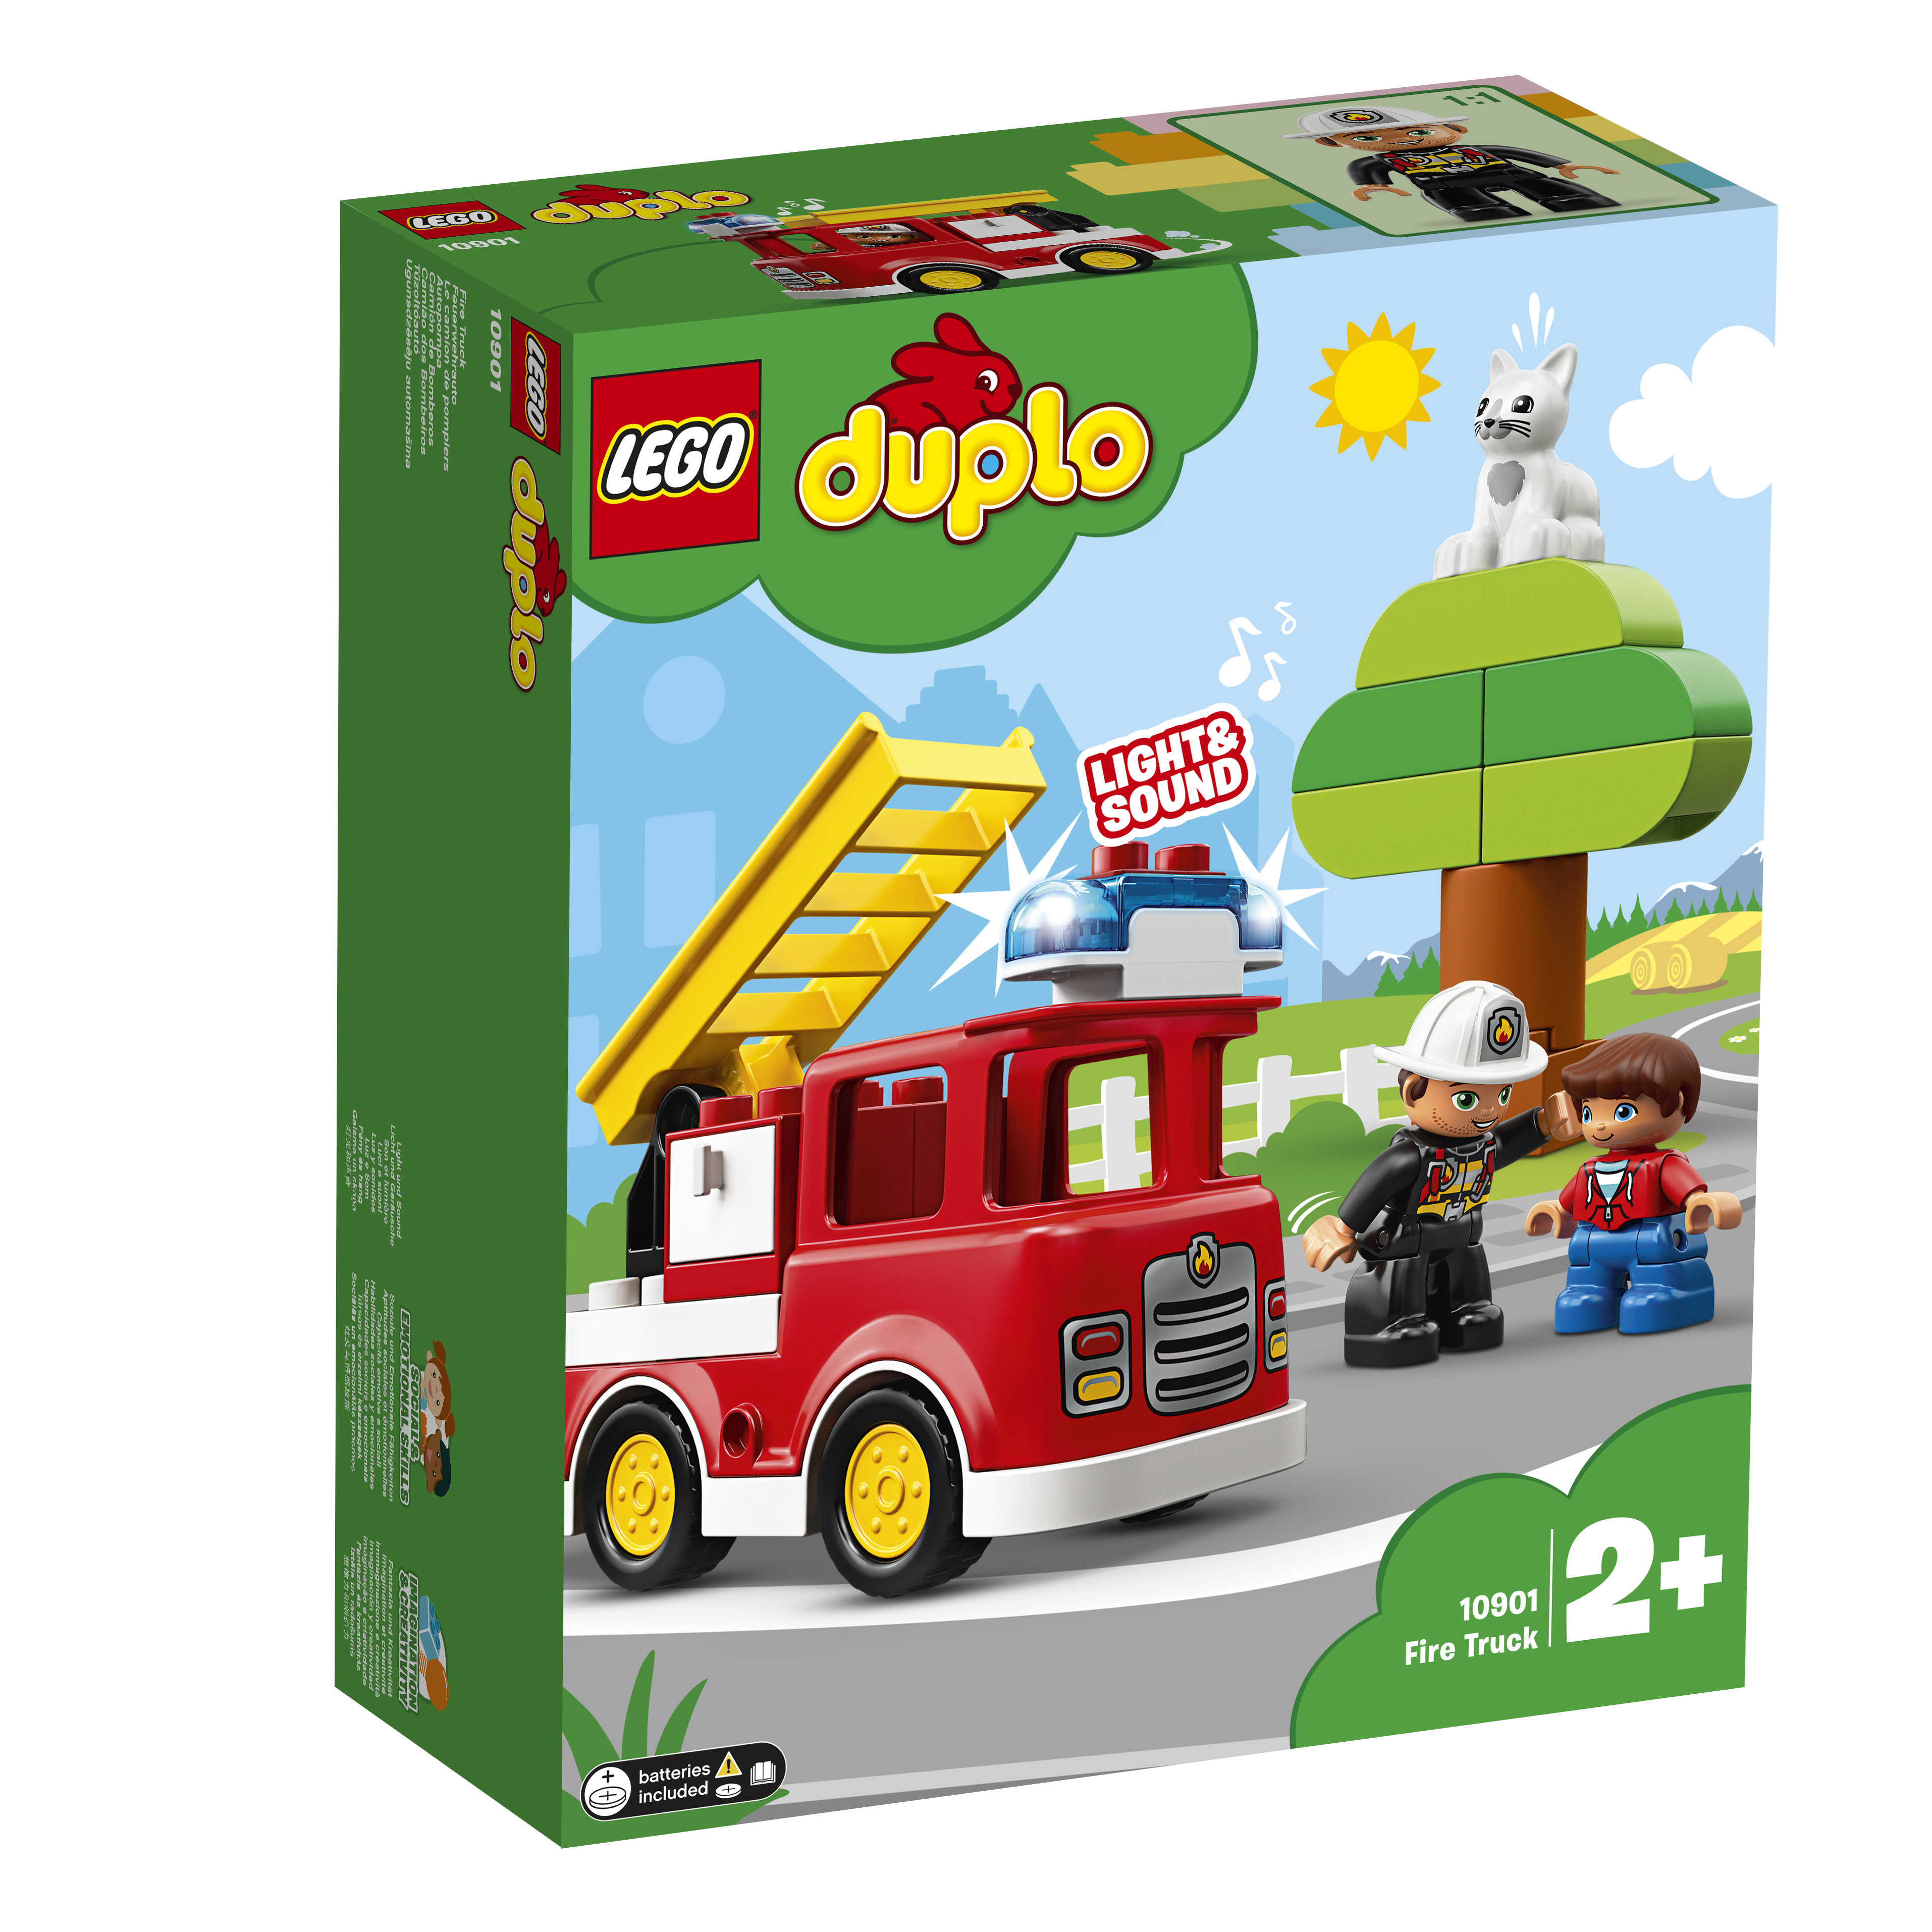 LEGO DUPLO  Конструктор   Town 10901 Пожарная машина